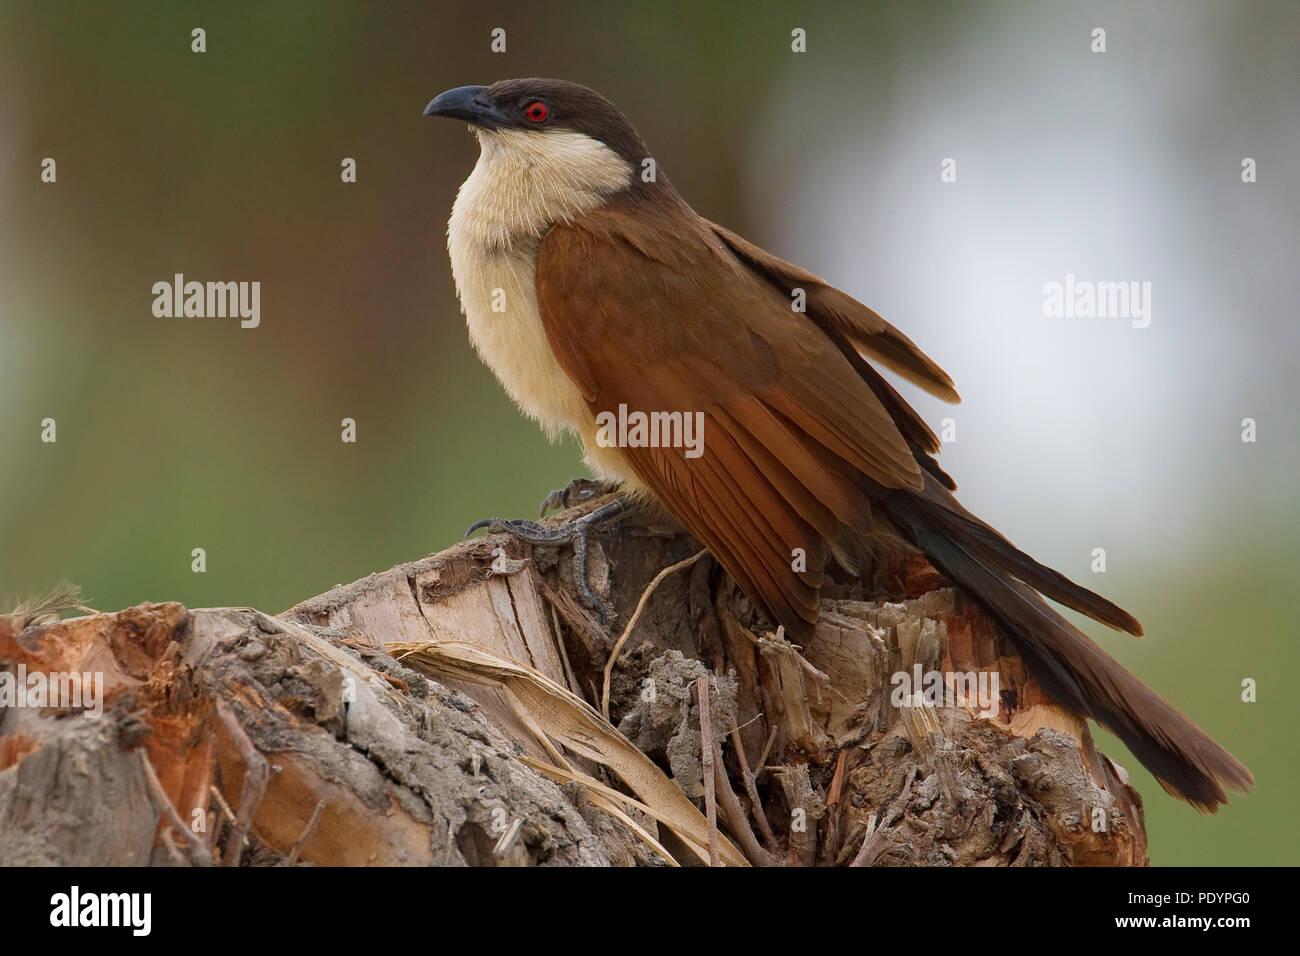 Senegal Coucal; Centropus senegalensis; Senegalese Spoorkoekoek - Stock Image